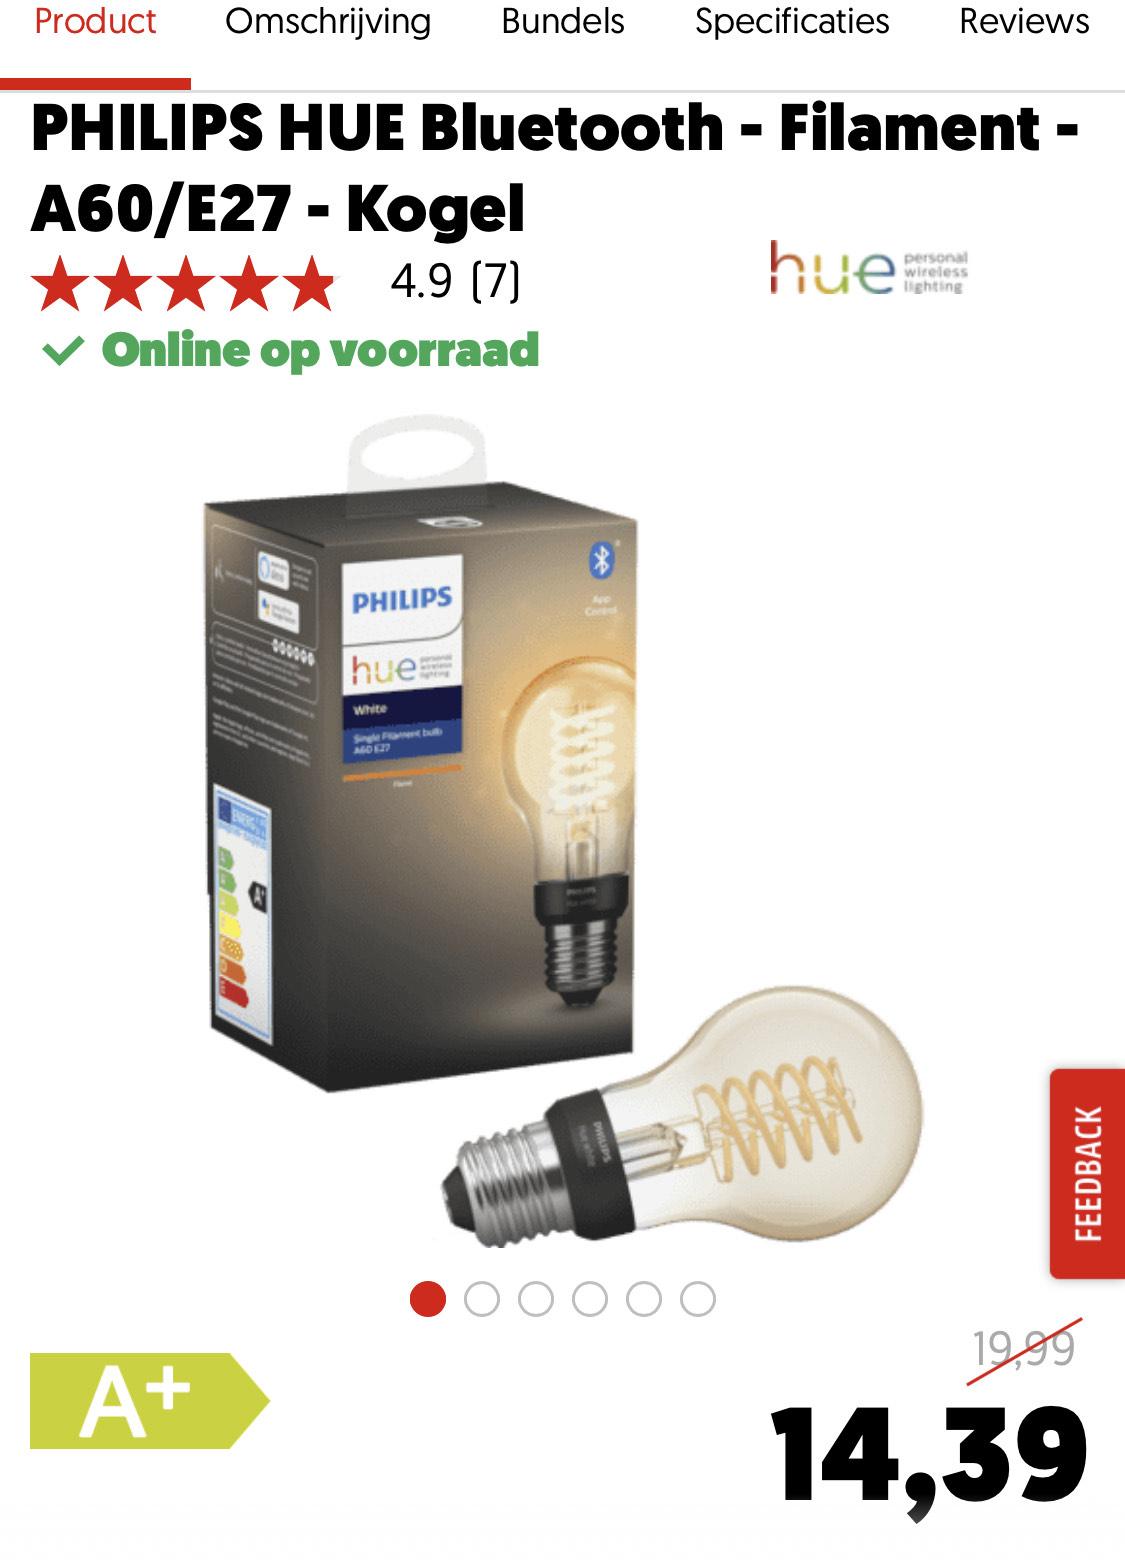 Philips Hue Filament 25% korting bij MediaMarkt NL